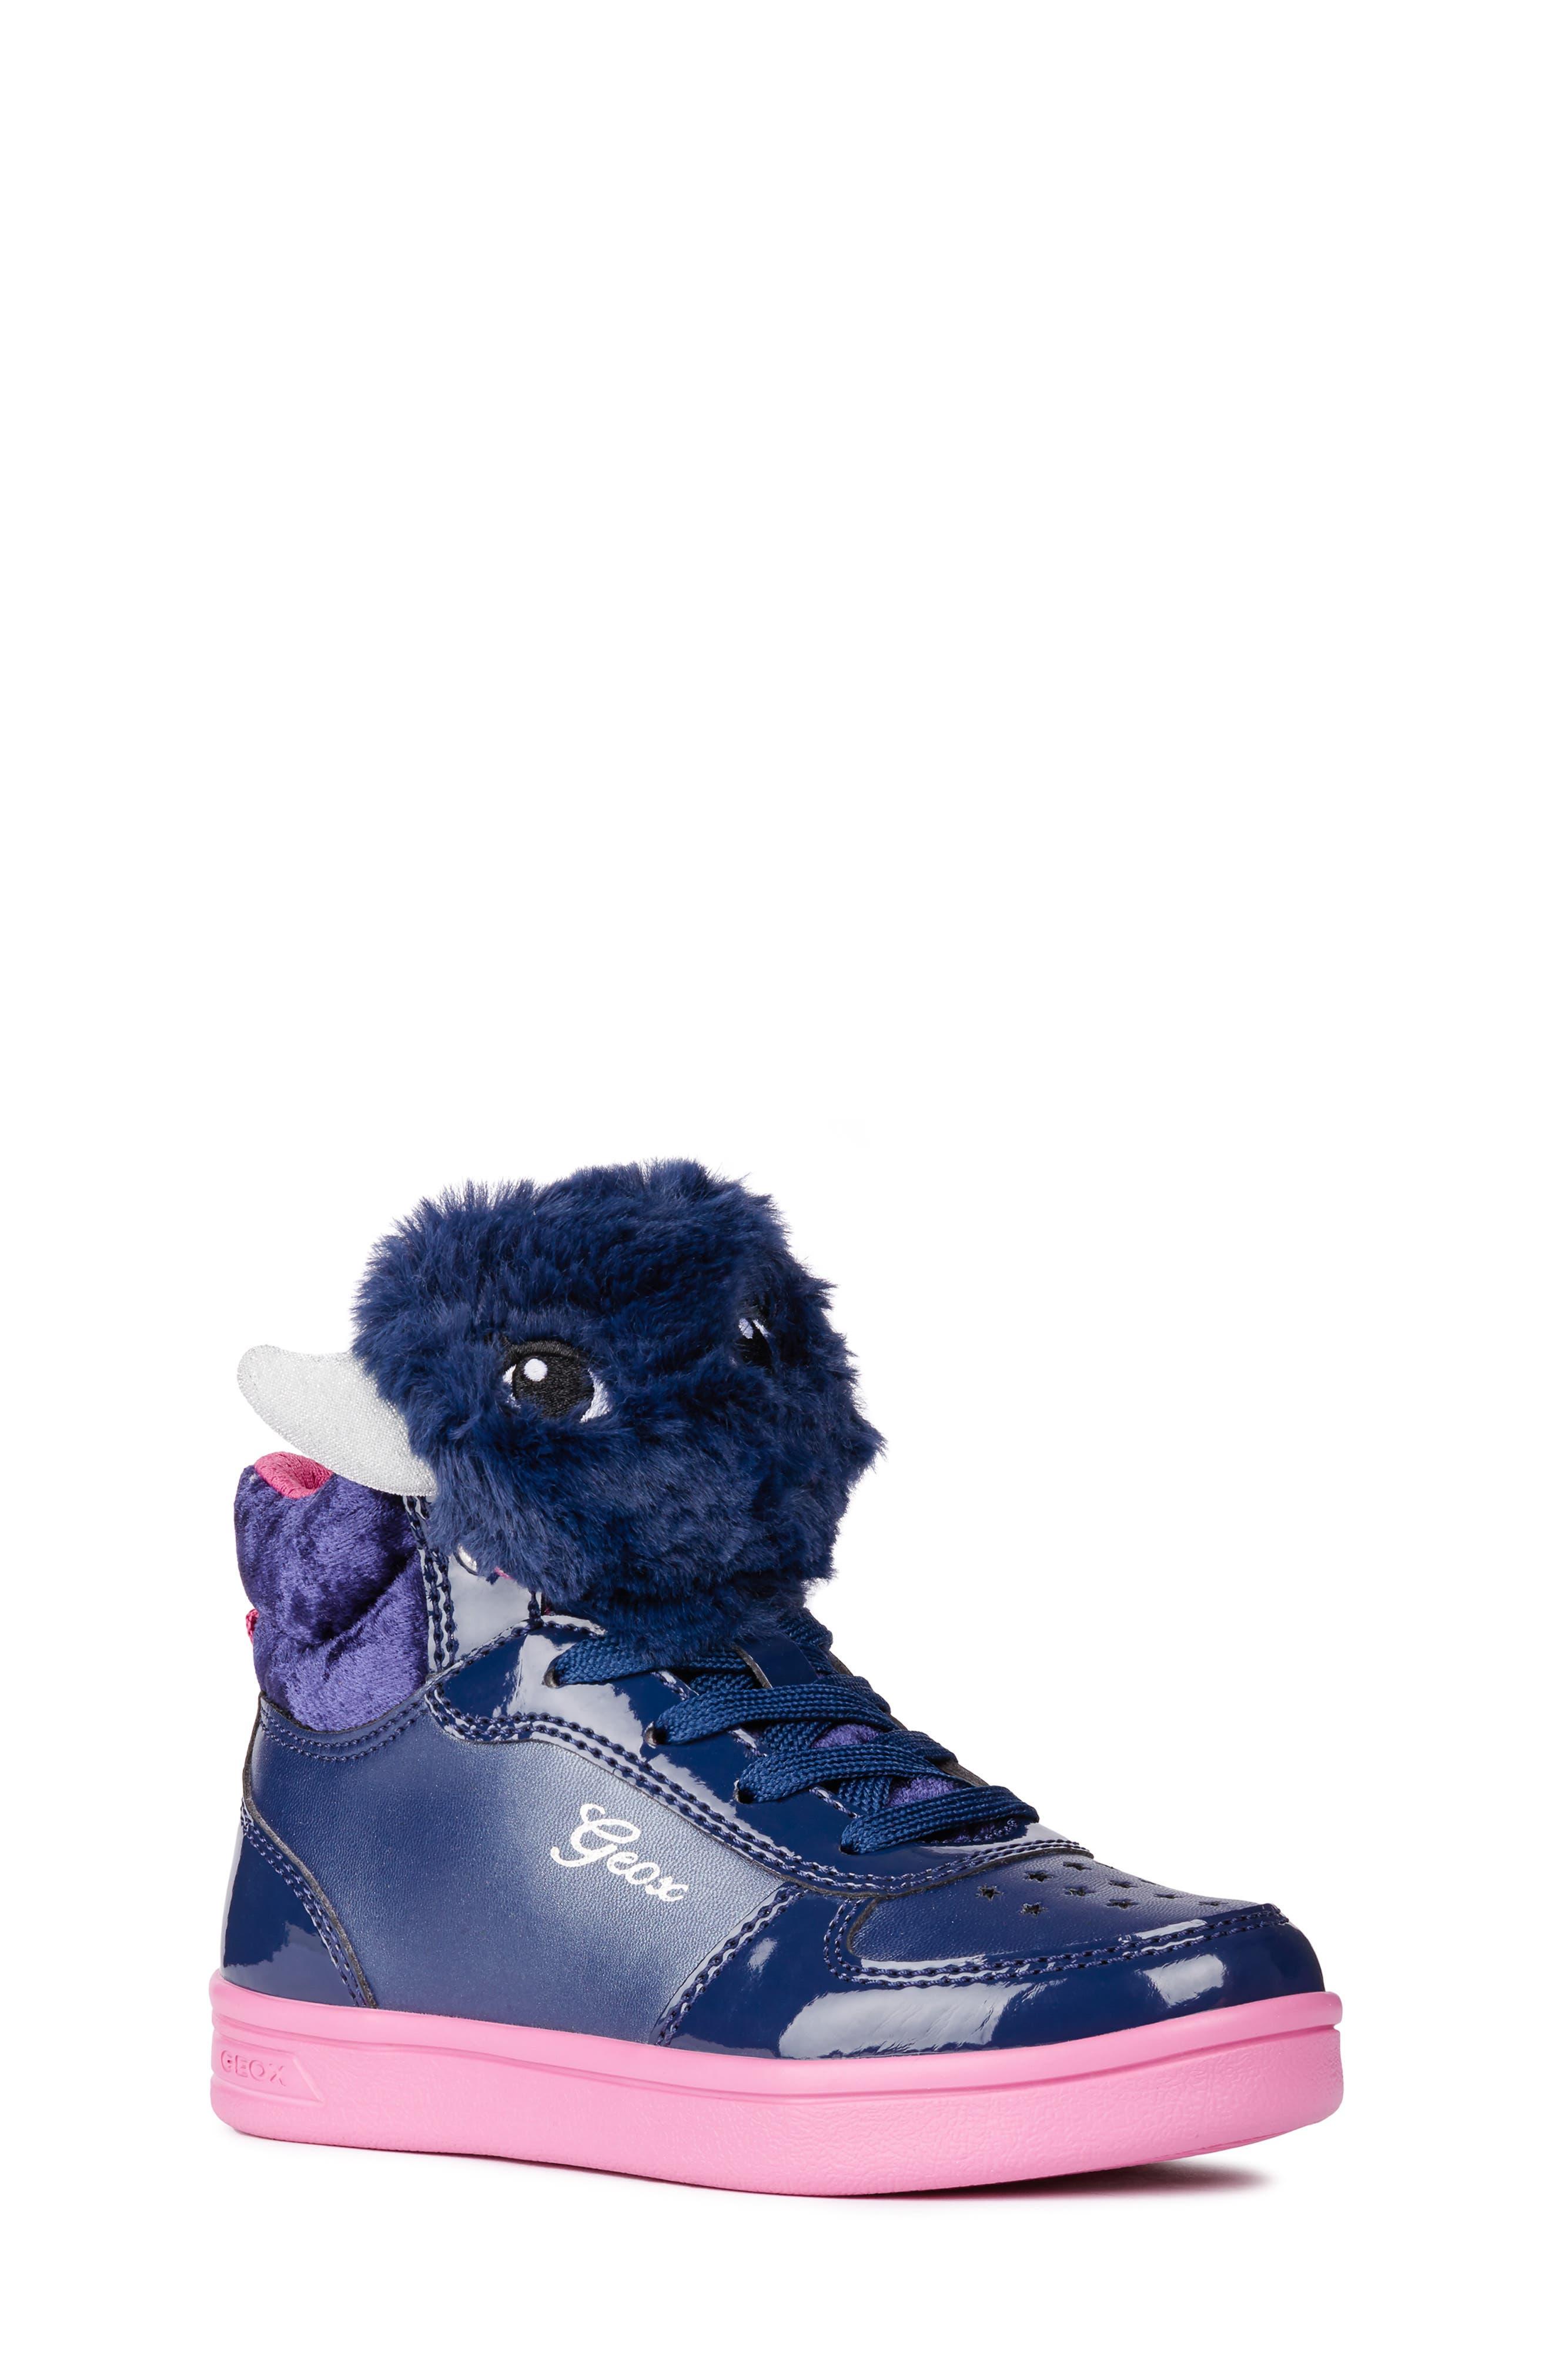 DJ Rock Fuzzy Friend Sneaker,                             Main thumbnail 1, color,                             NAVY/FUCHSIA